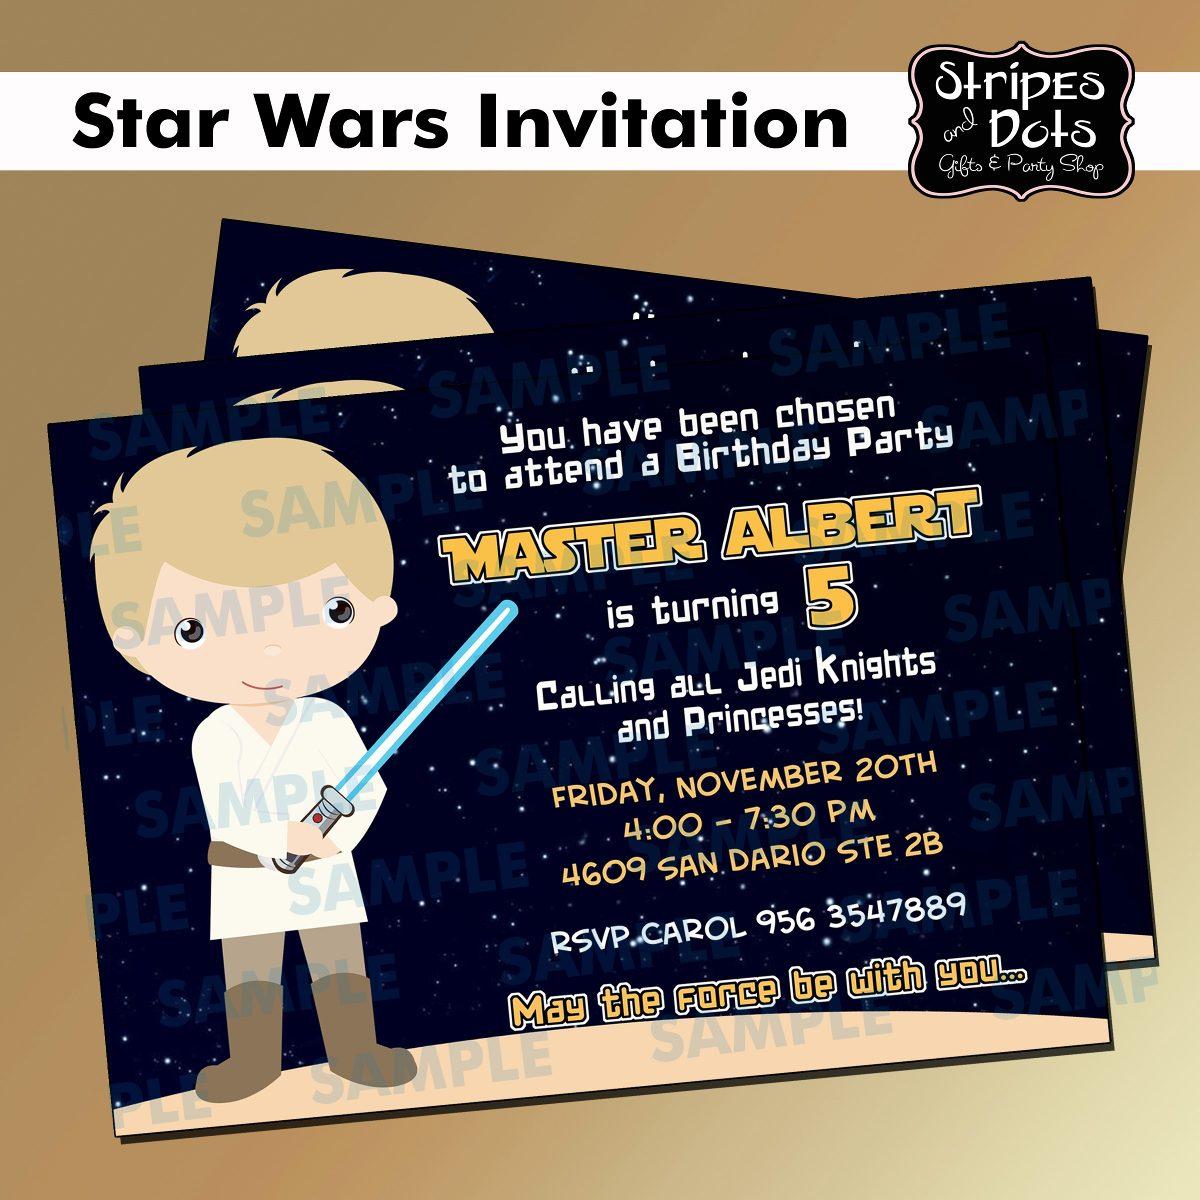 Star Wars Birthday Invitation with amazing invitation example